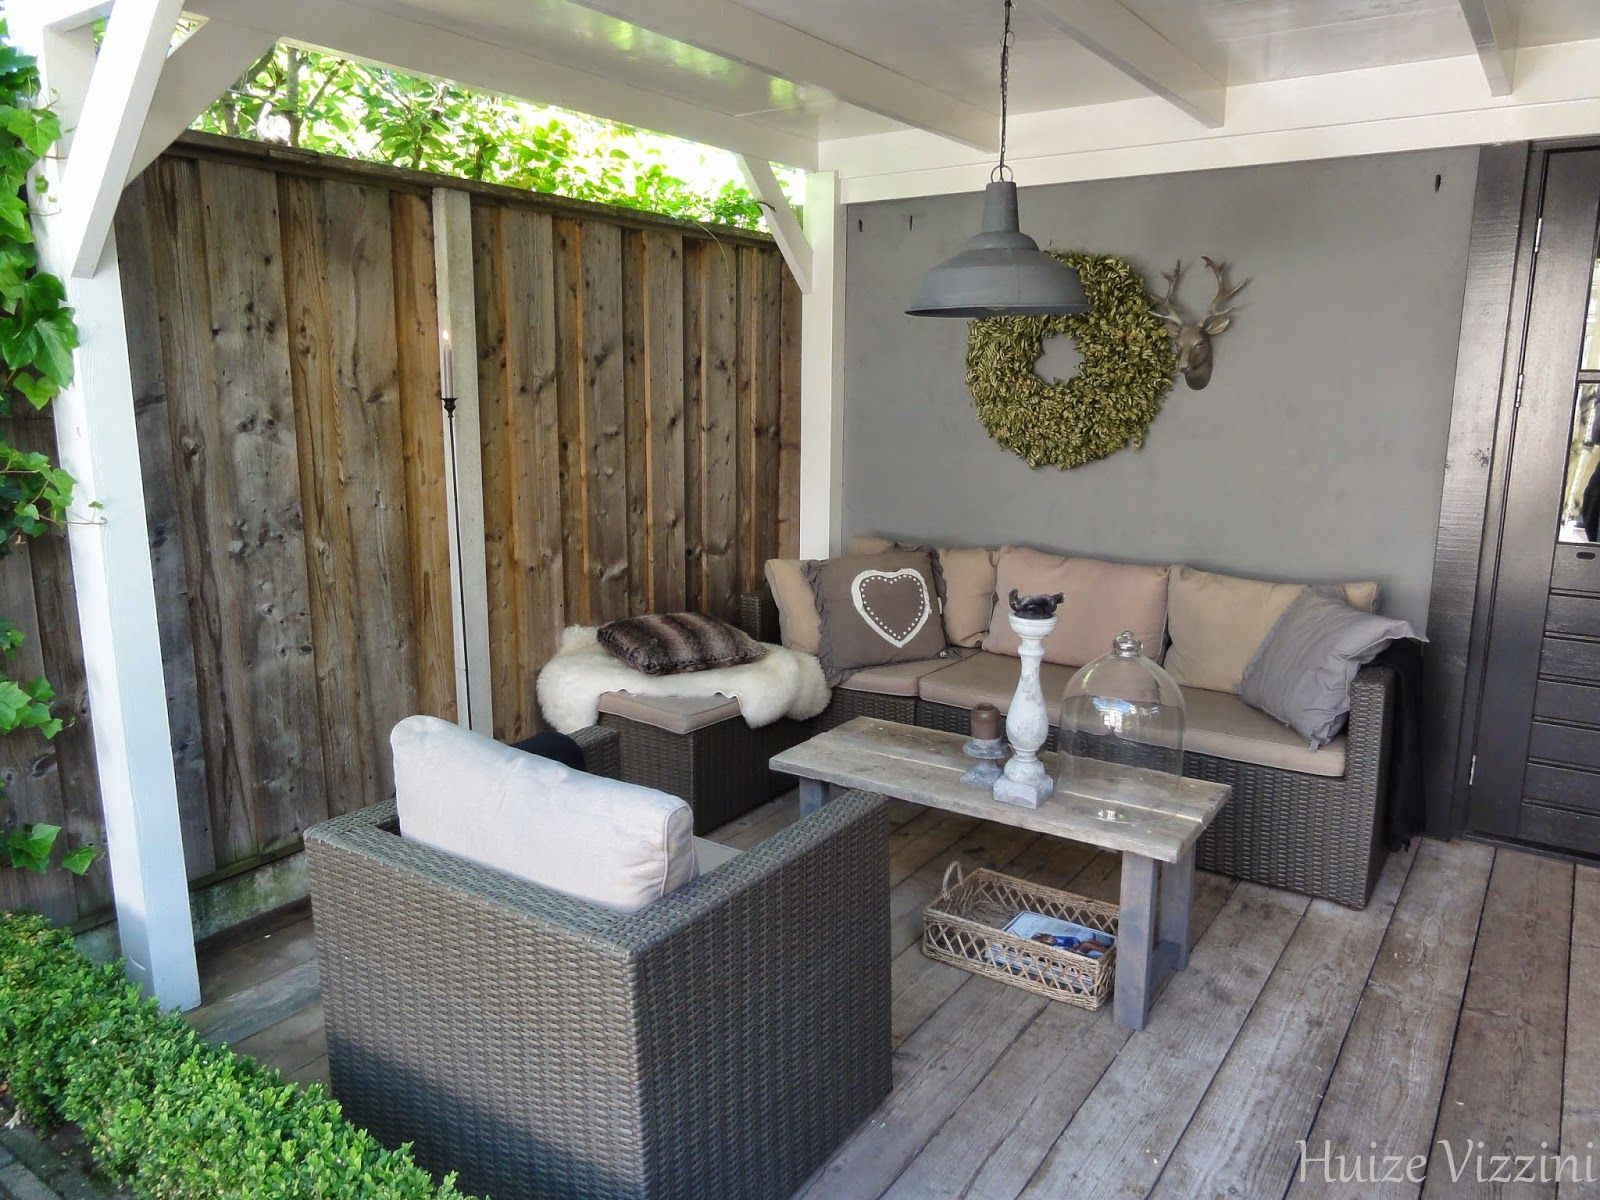 Buiten Sitzecken garten, Garten, Haus und garten